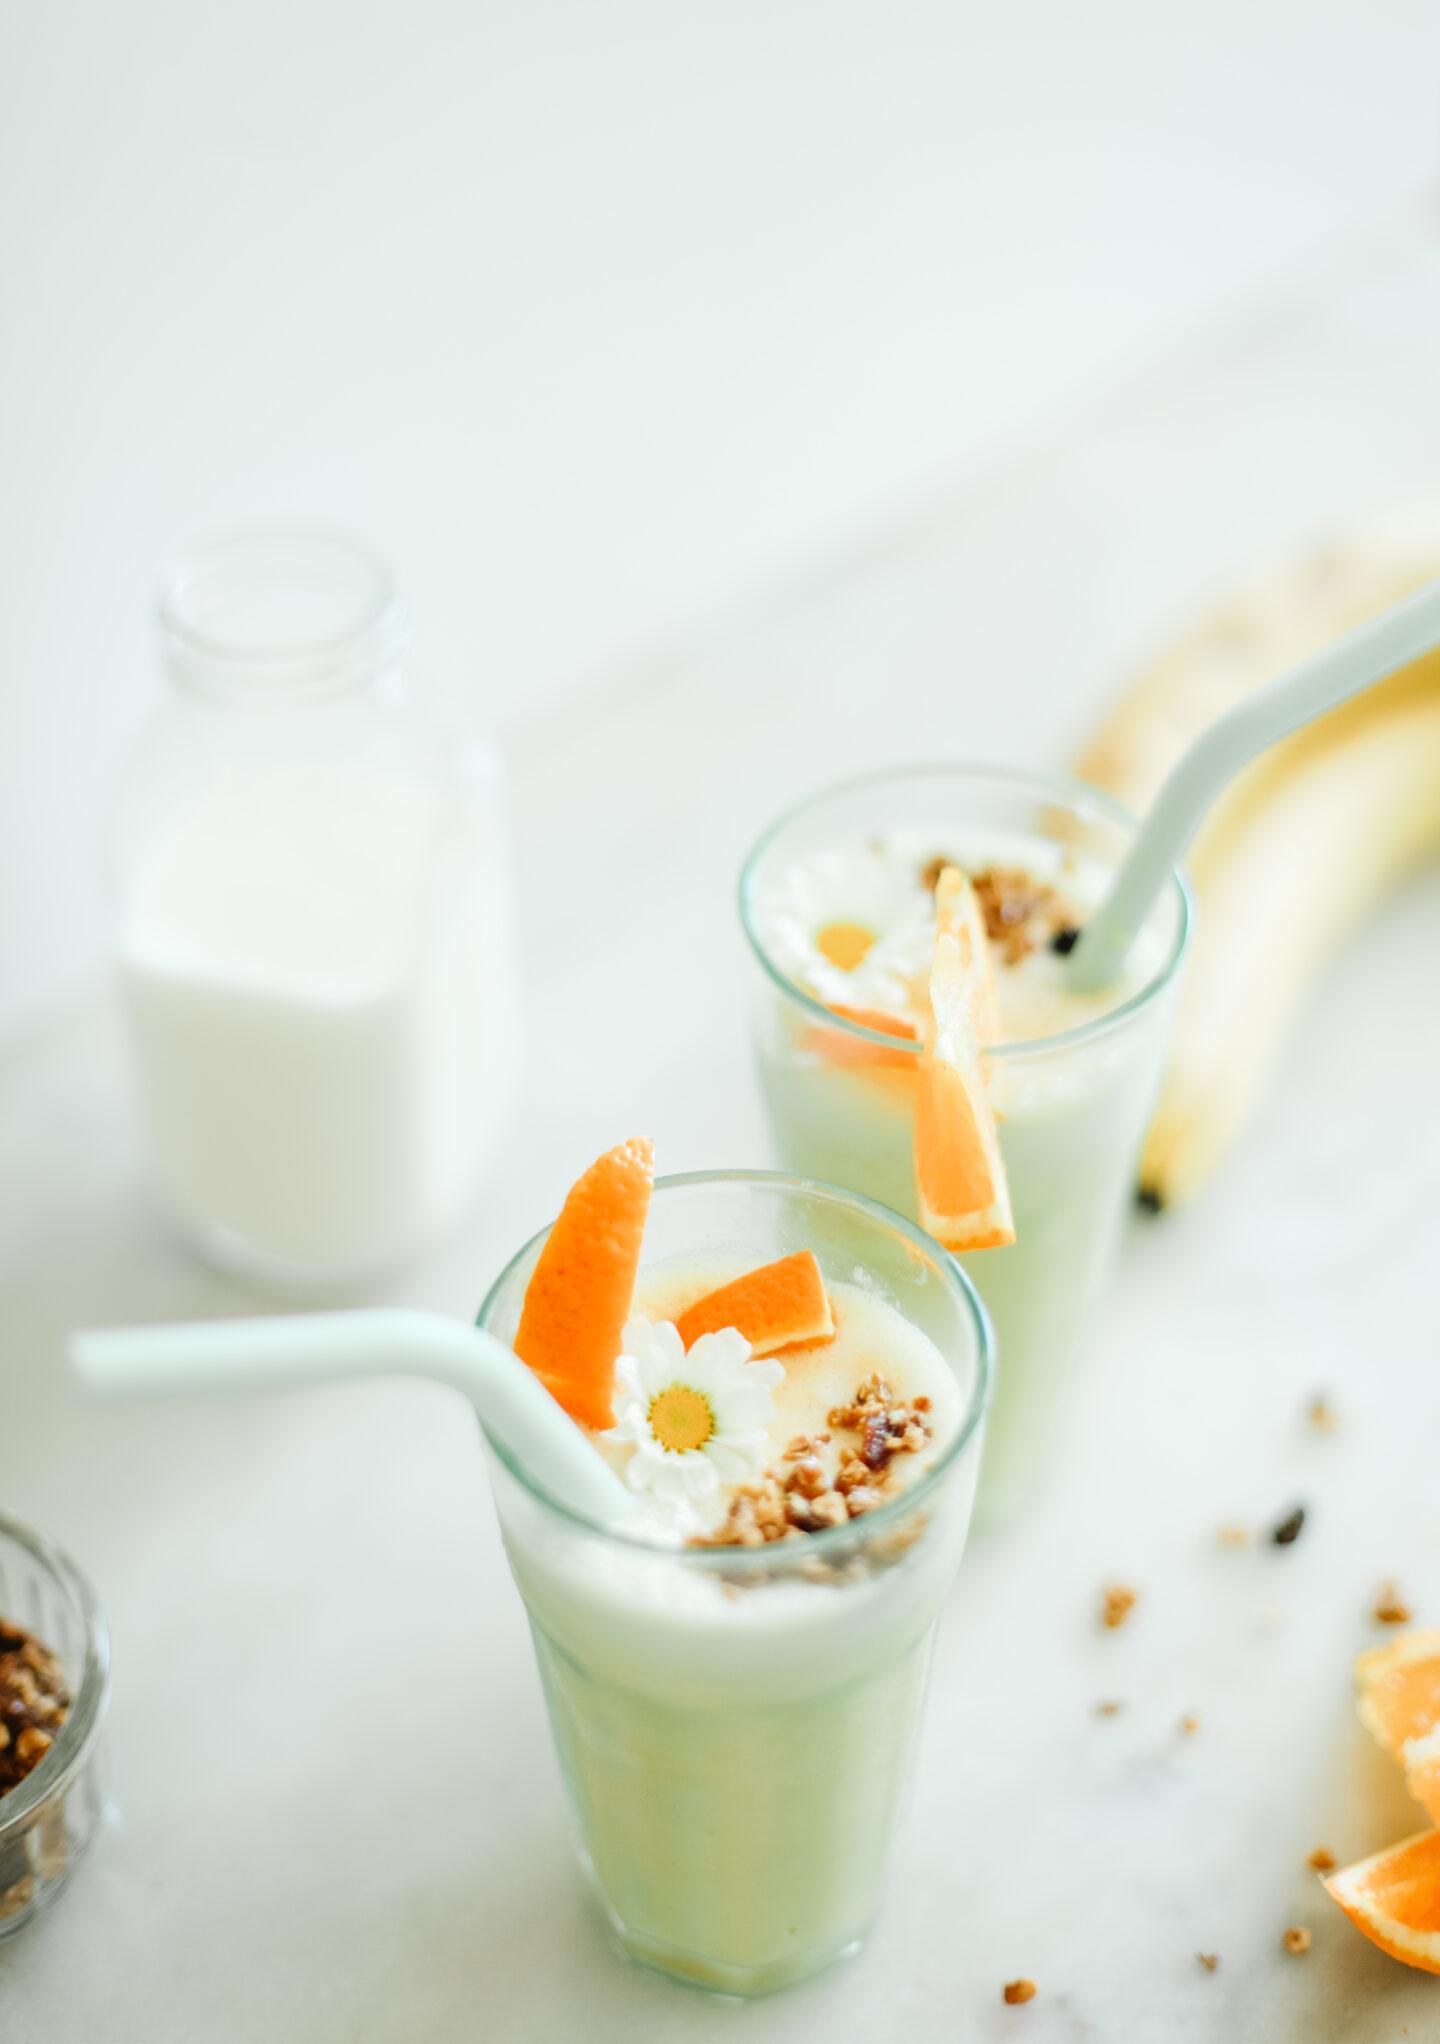 Easy Smoothie recipe: Orange Banana!